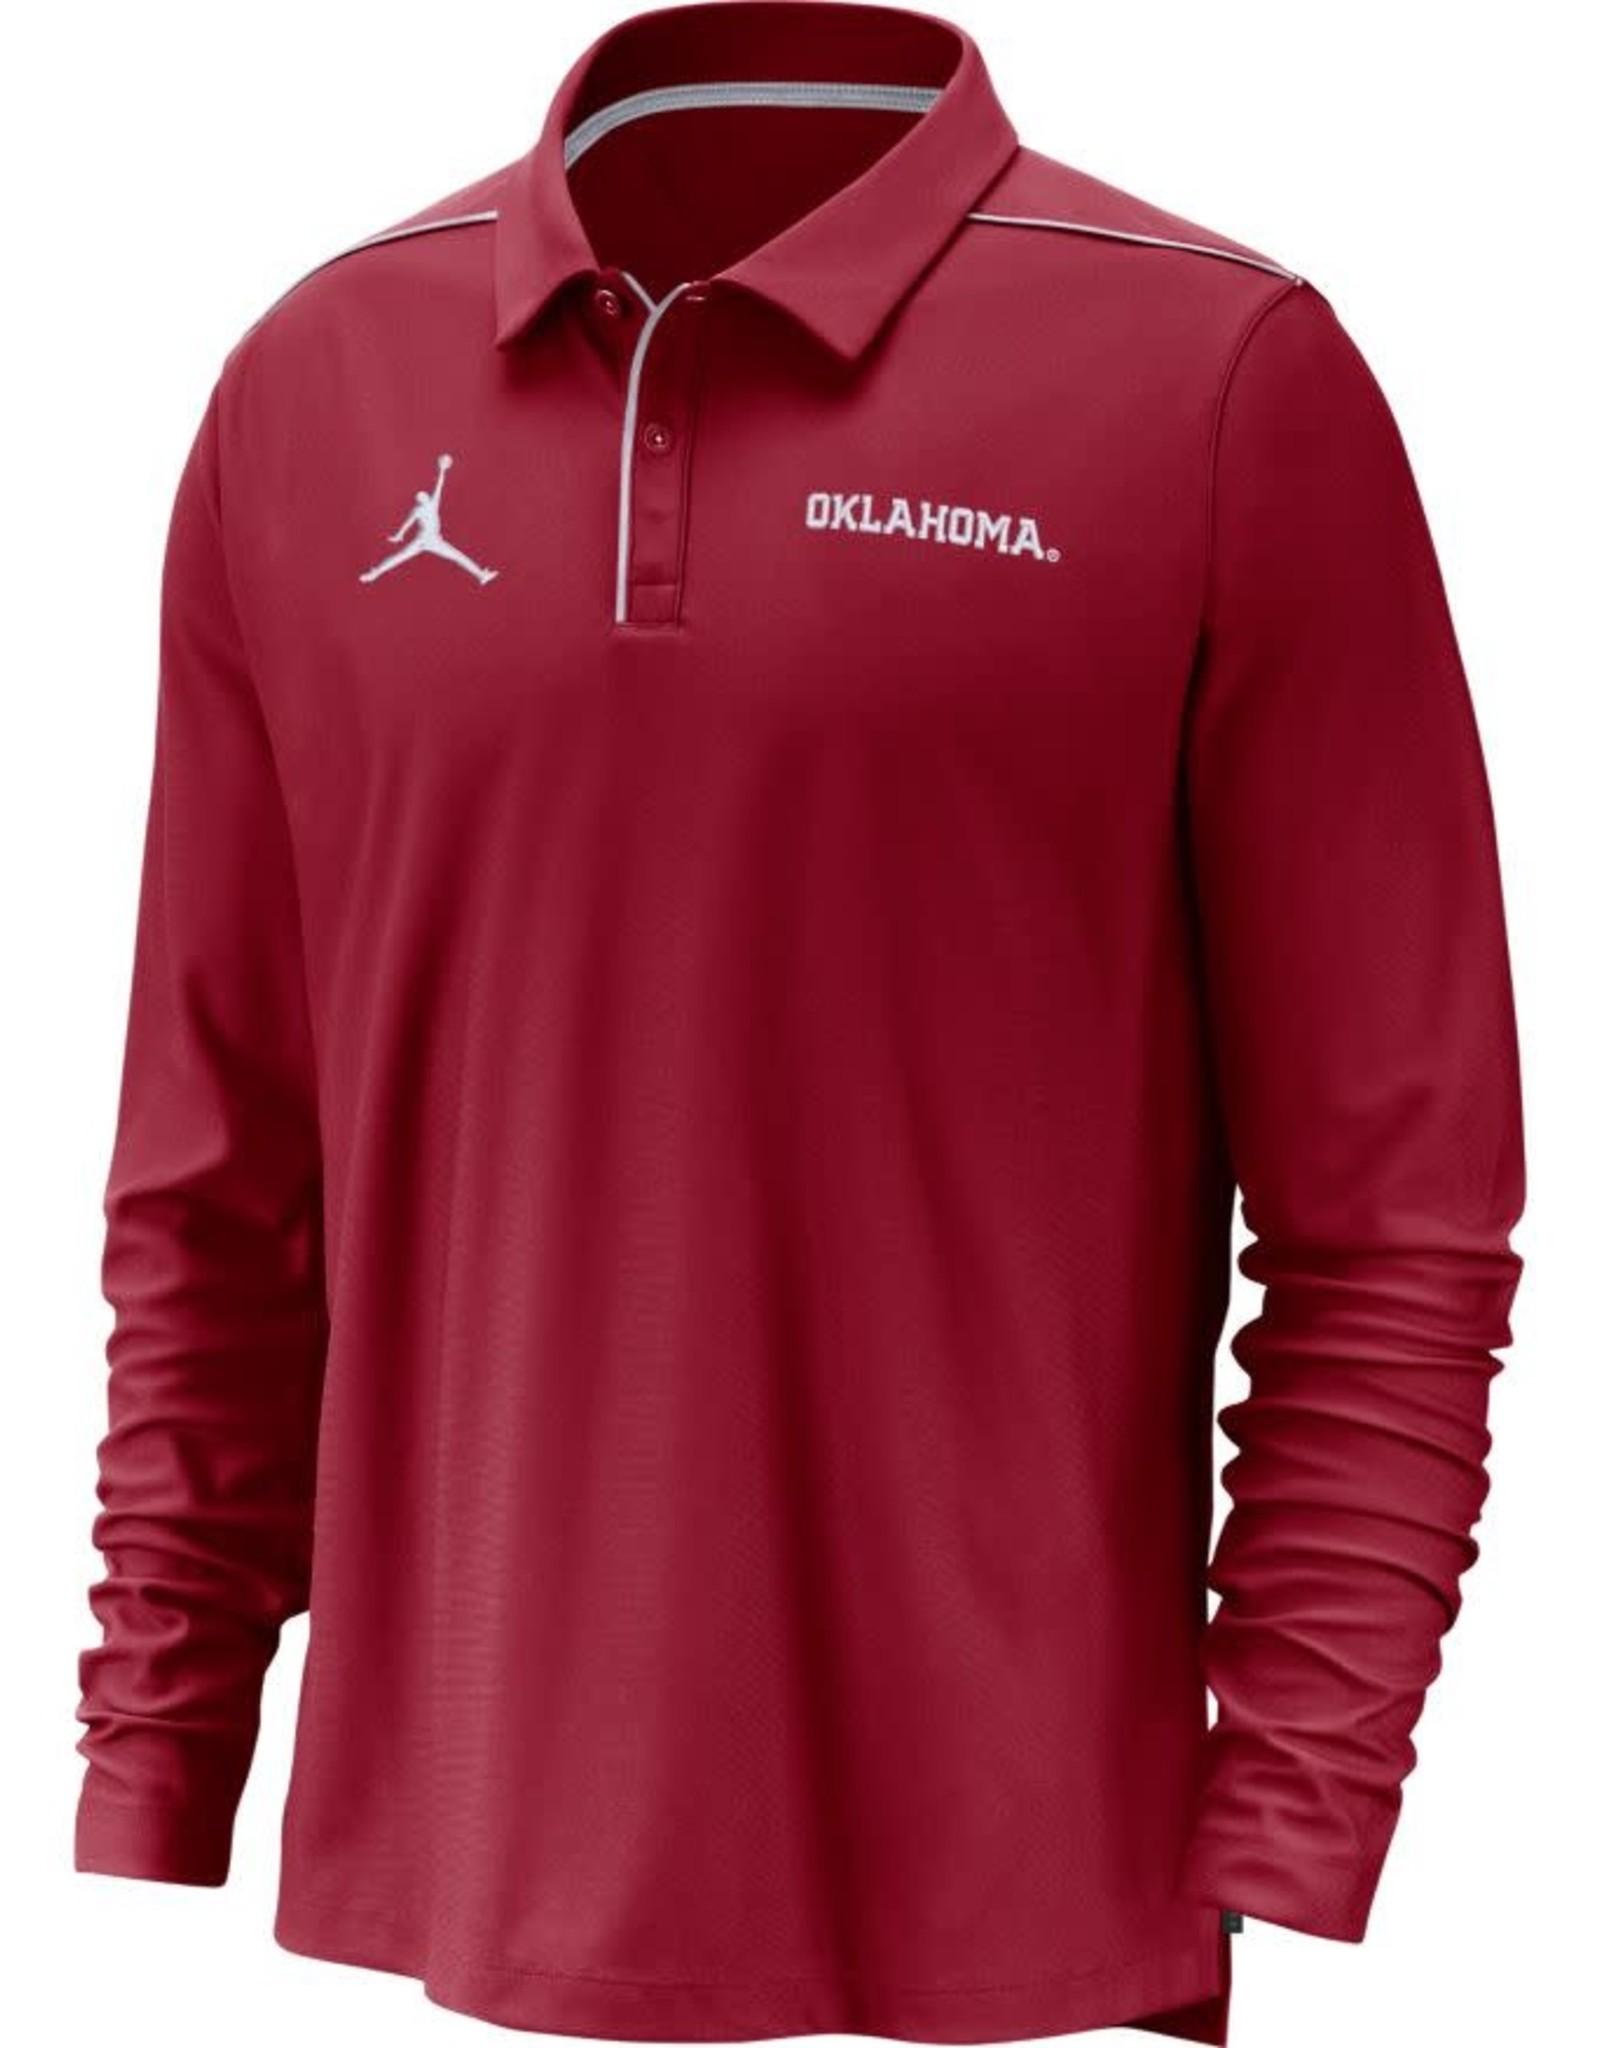 Jordan Men's Jordan OU Crimson Team Issue Long-Sleeve Polo